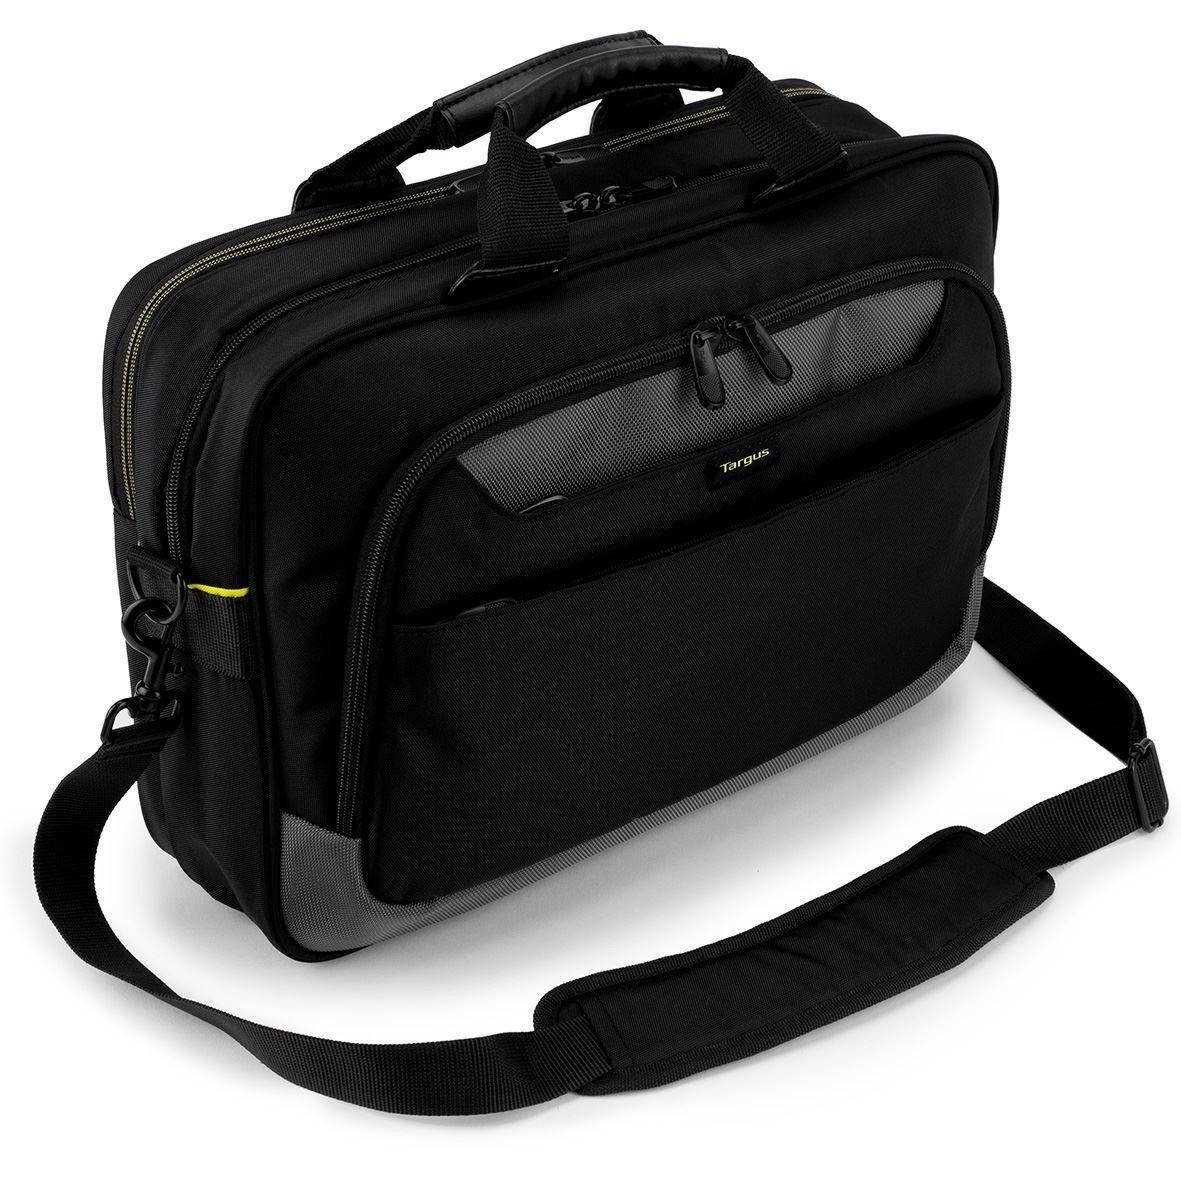 Targus torba do notebooka CityGear 15.6 Topload czarna